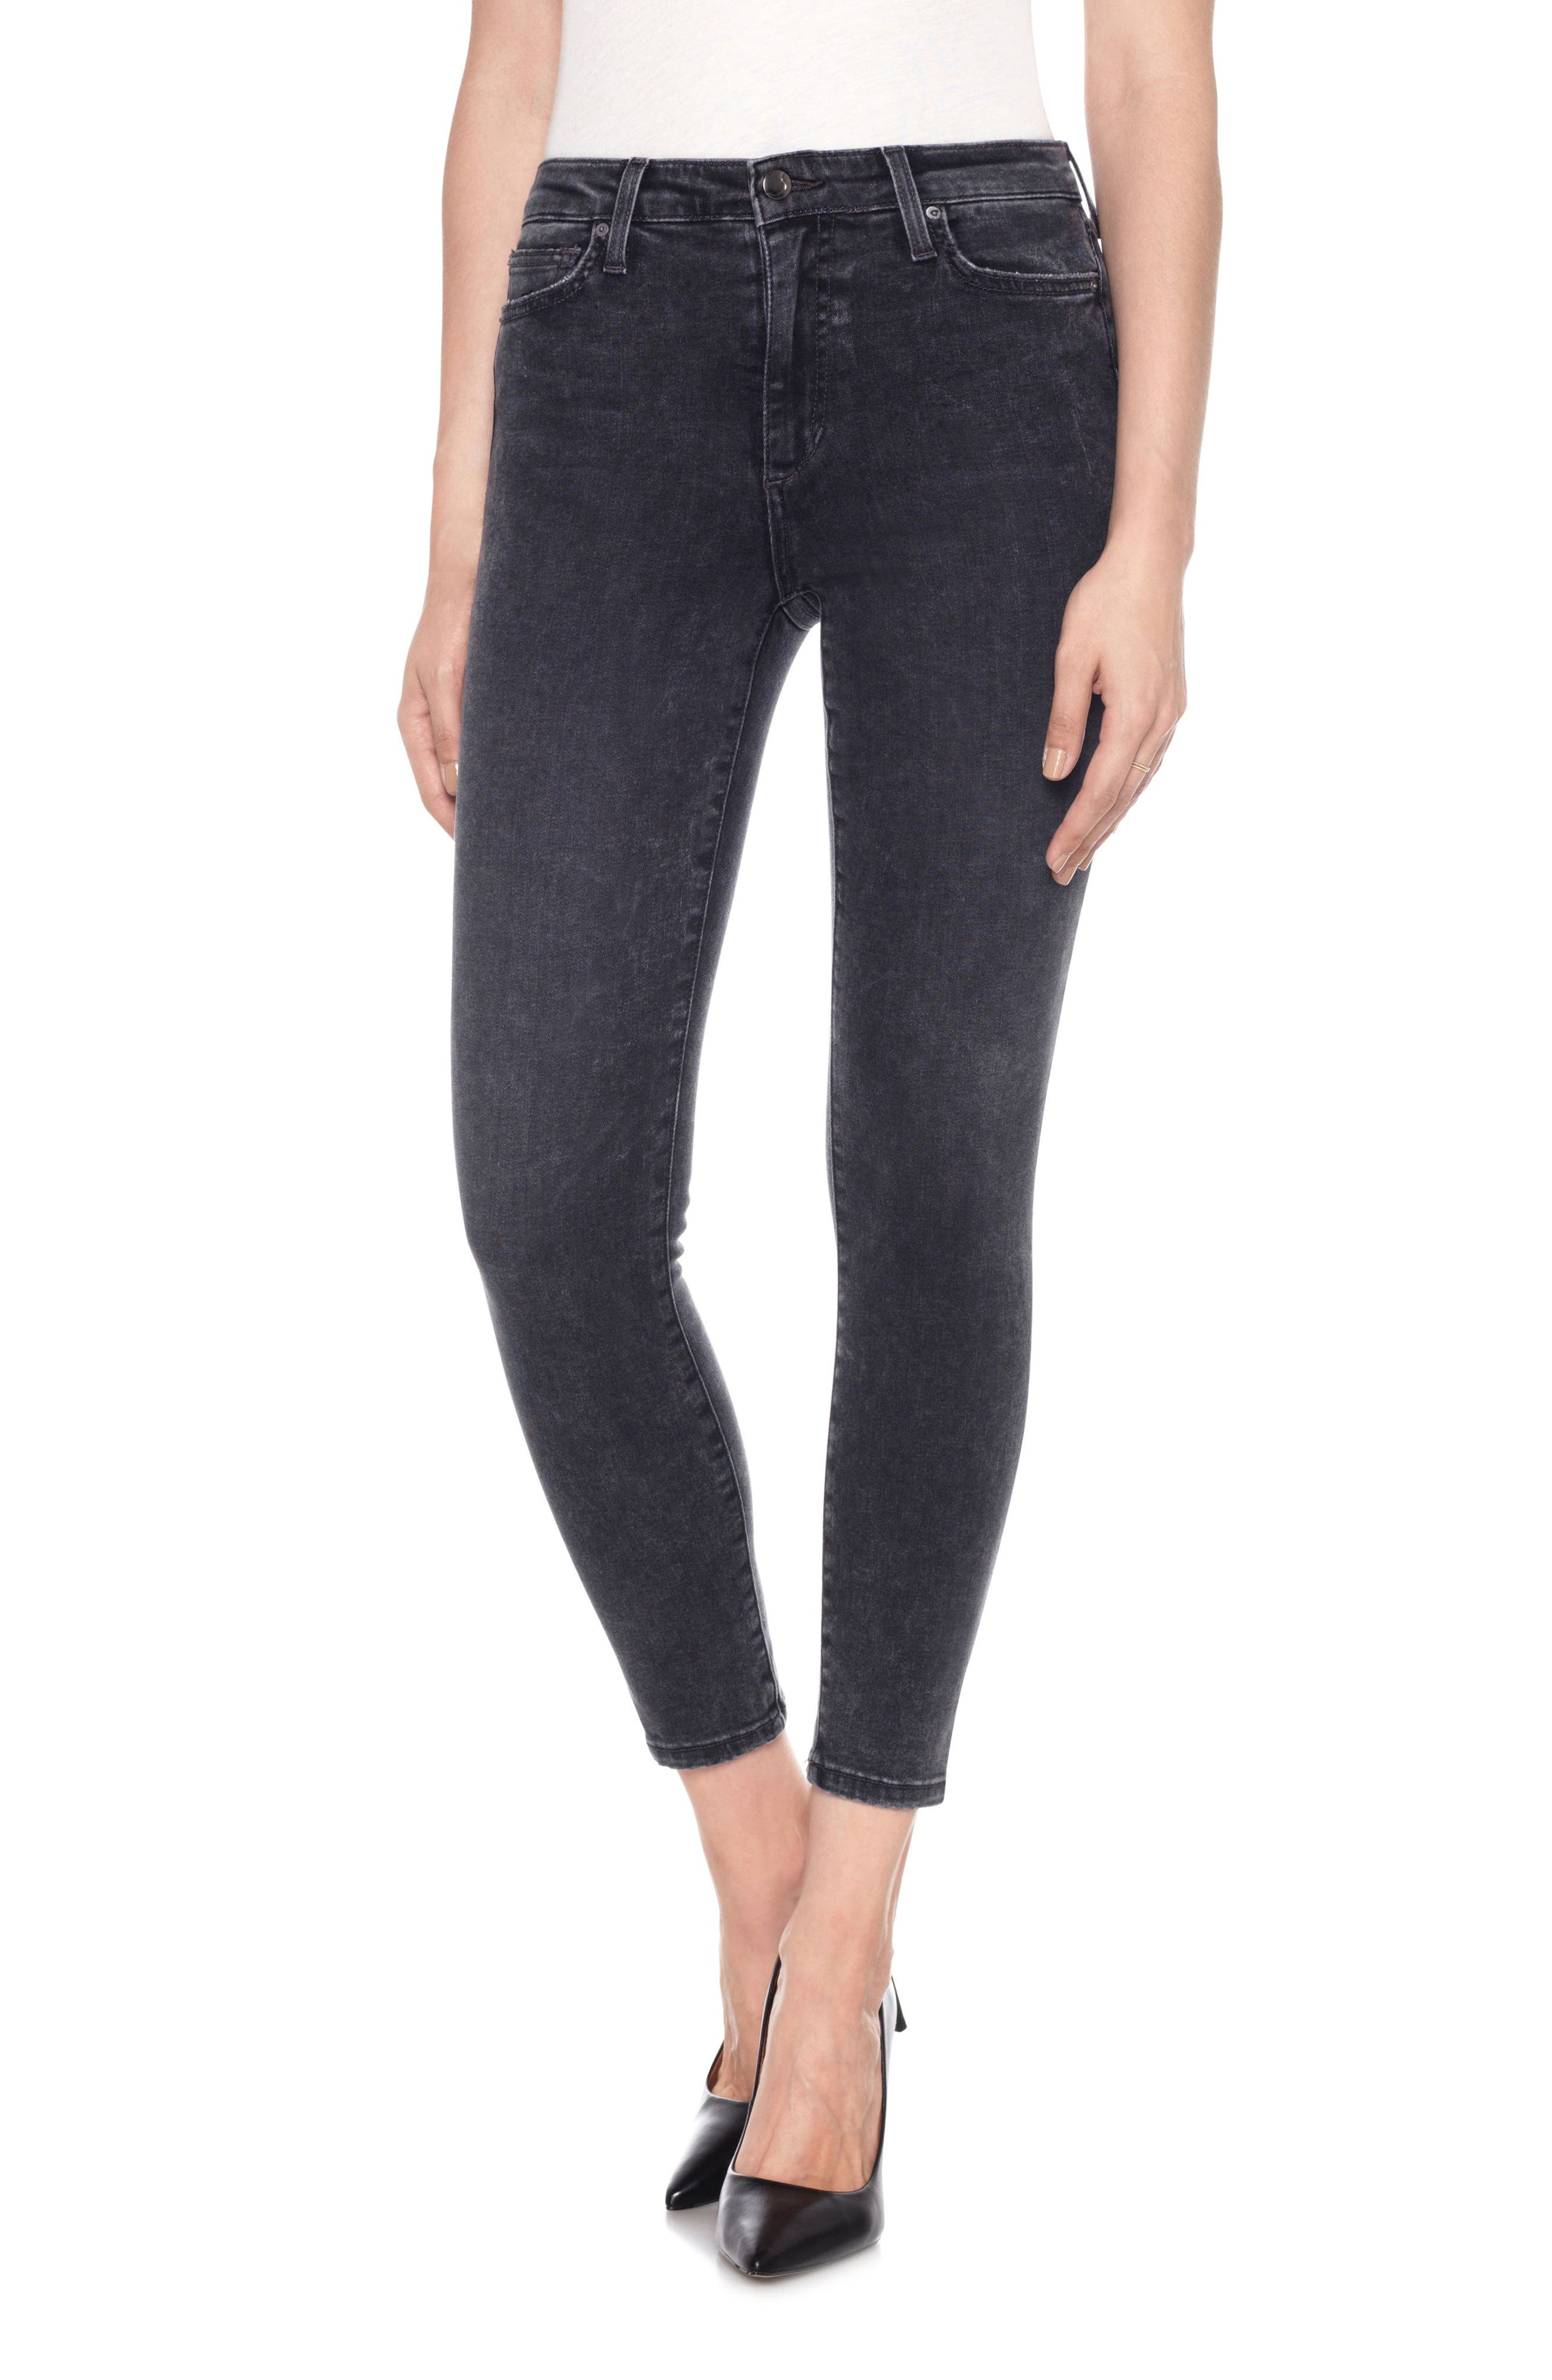 Charlie High Waist Ankle Skinny Jeans,                         Main,                         color, 018